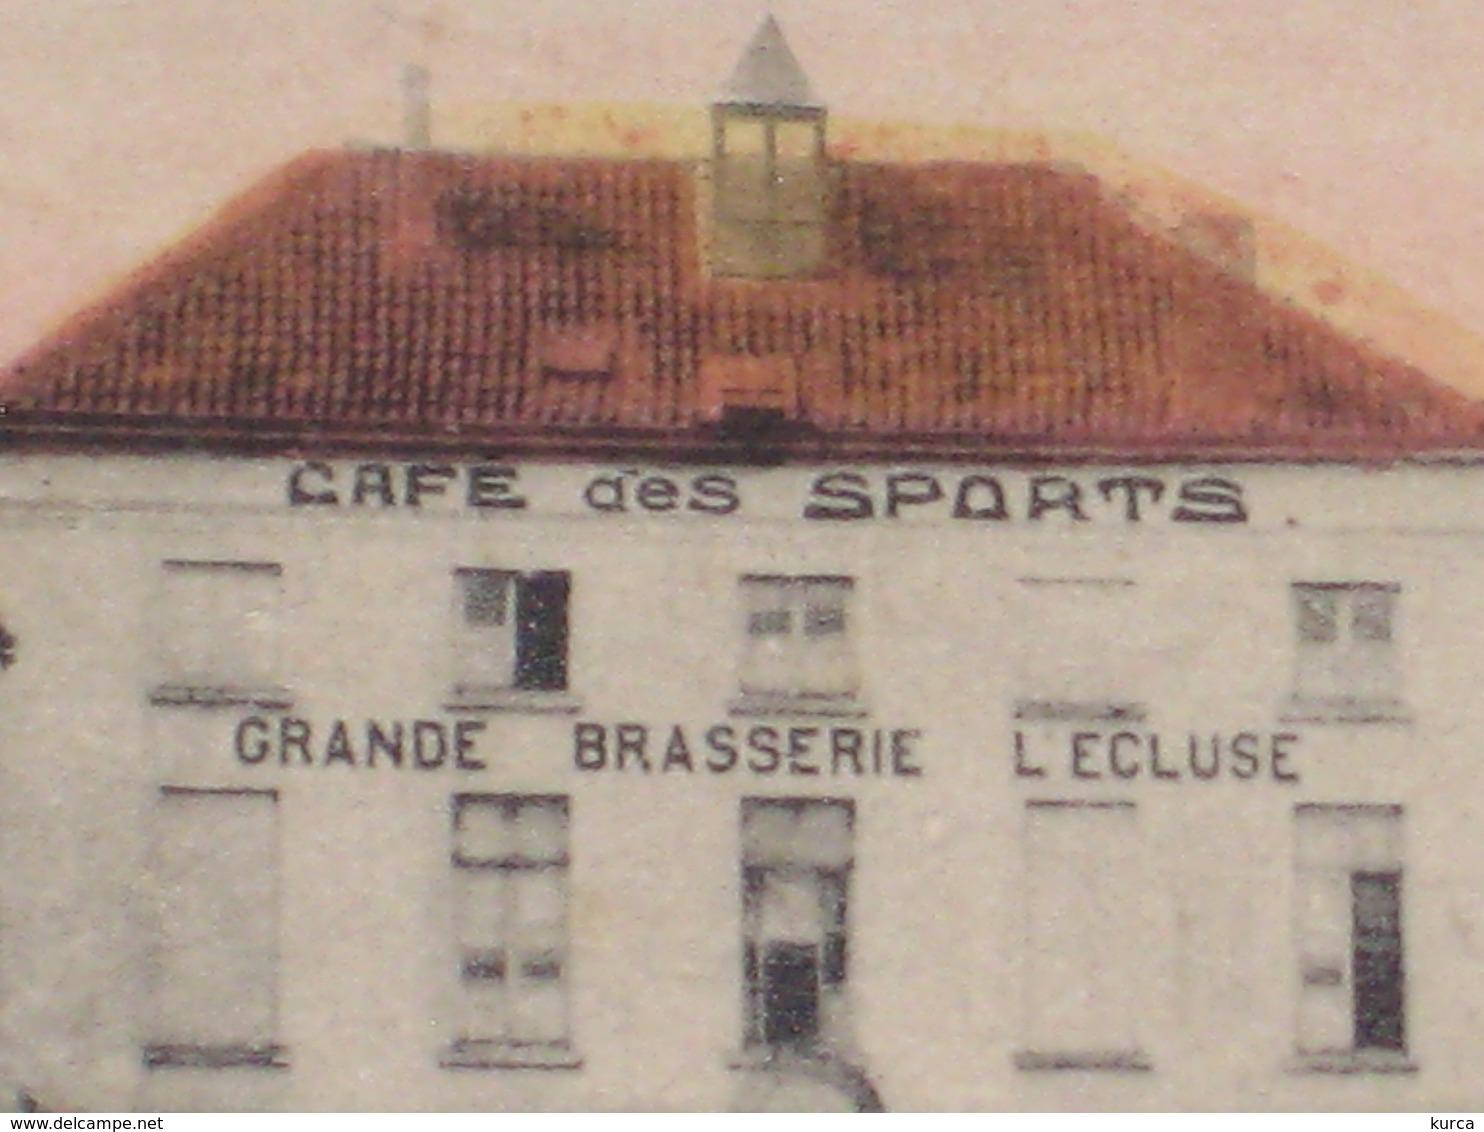 MECHELEN - CAFE DES SPORTS BRASSERIE L'ECLUSE Raghenoplaats - Niet Verstuurd - Uitg. Holemans - Malines